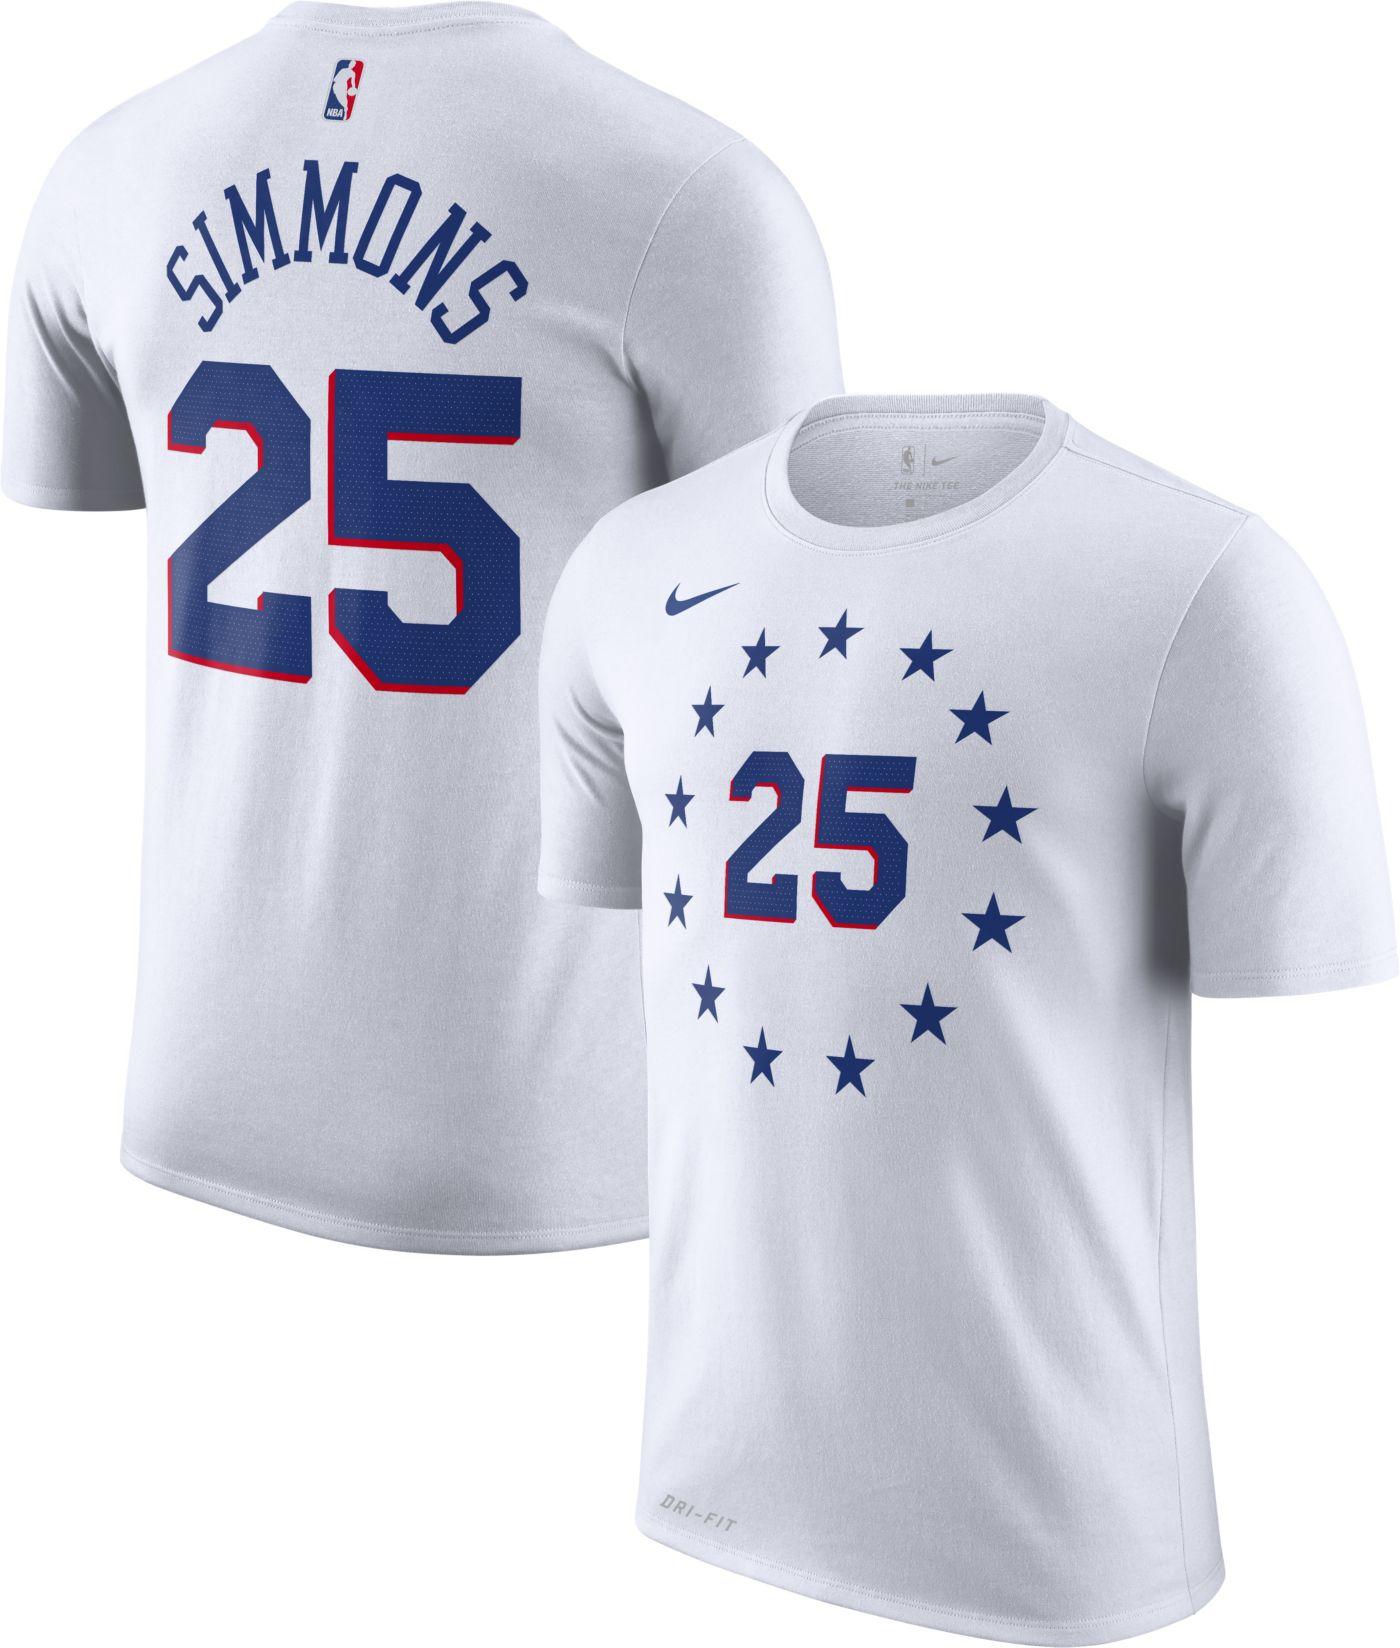 Nike Youth Philadelphia 76ers Ben Simmons Dri-FIT Earned Edition T-Shirt